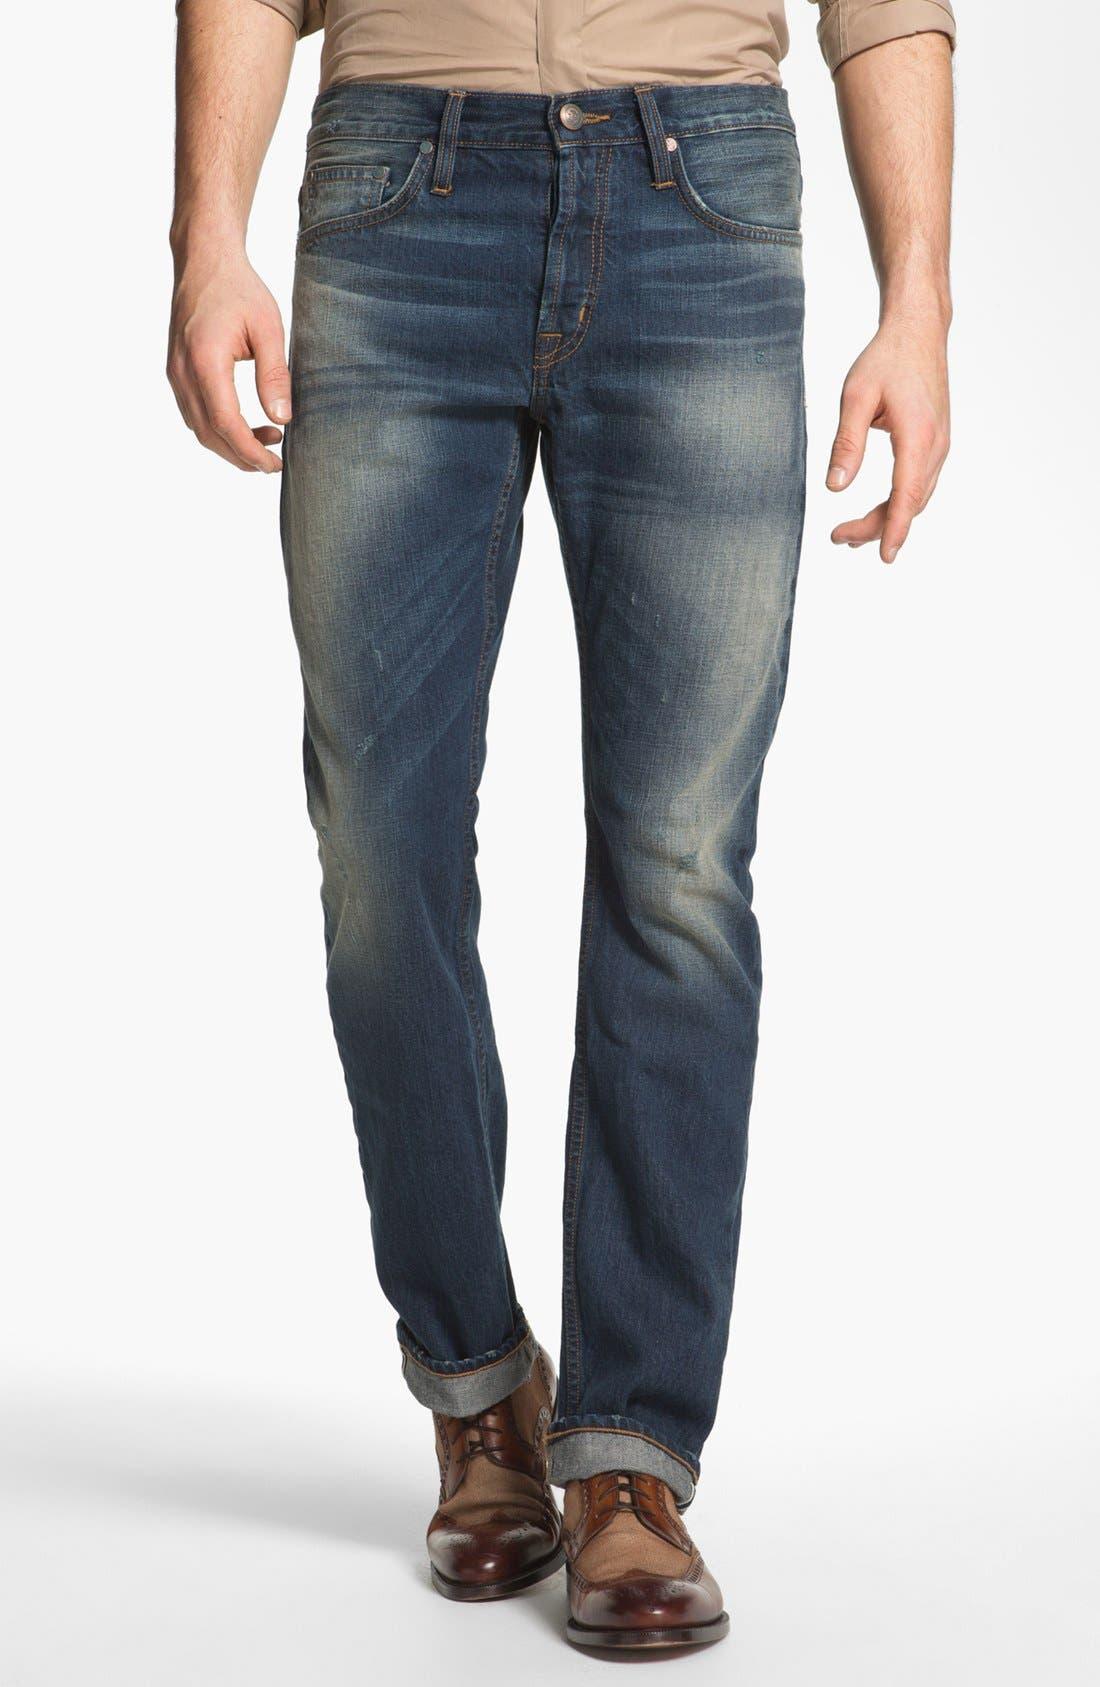 Main Image - Asbury Park '1874 Monte Carlo' Straight Leg Selvedge Jeans (Harrison)